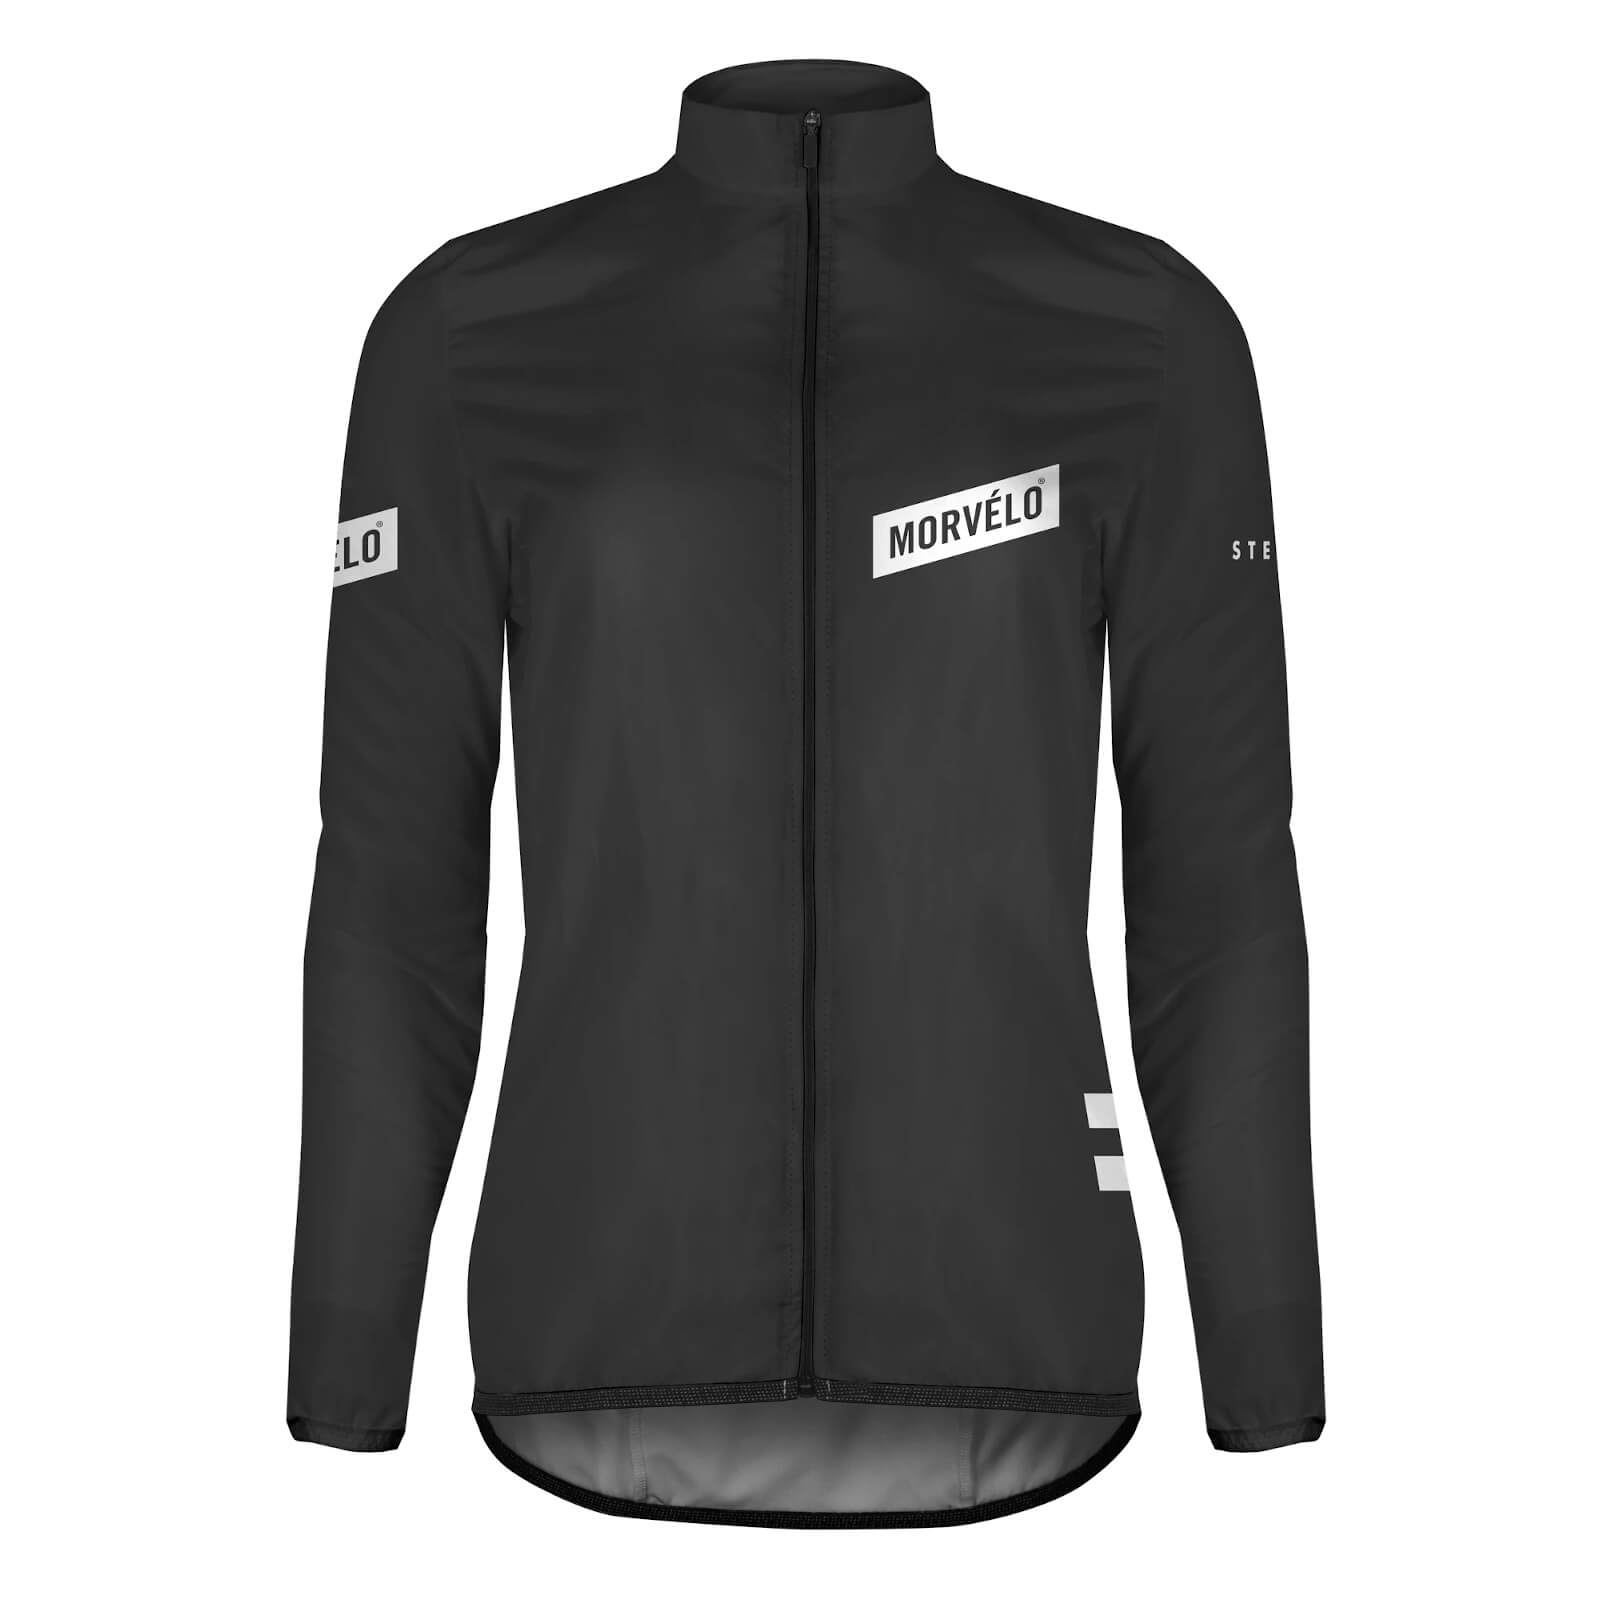 Morvelo Women's Stealth Aegis Packable Windproof Jacket - XS